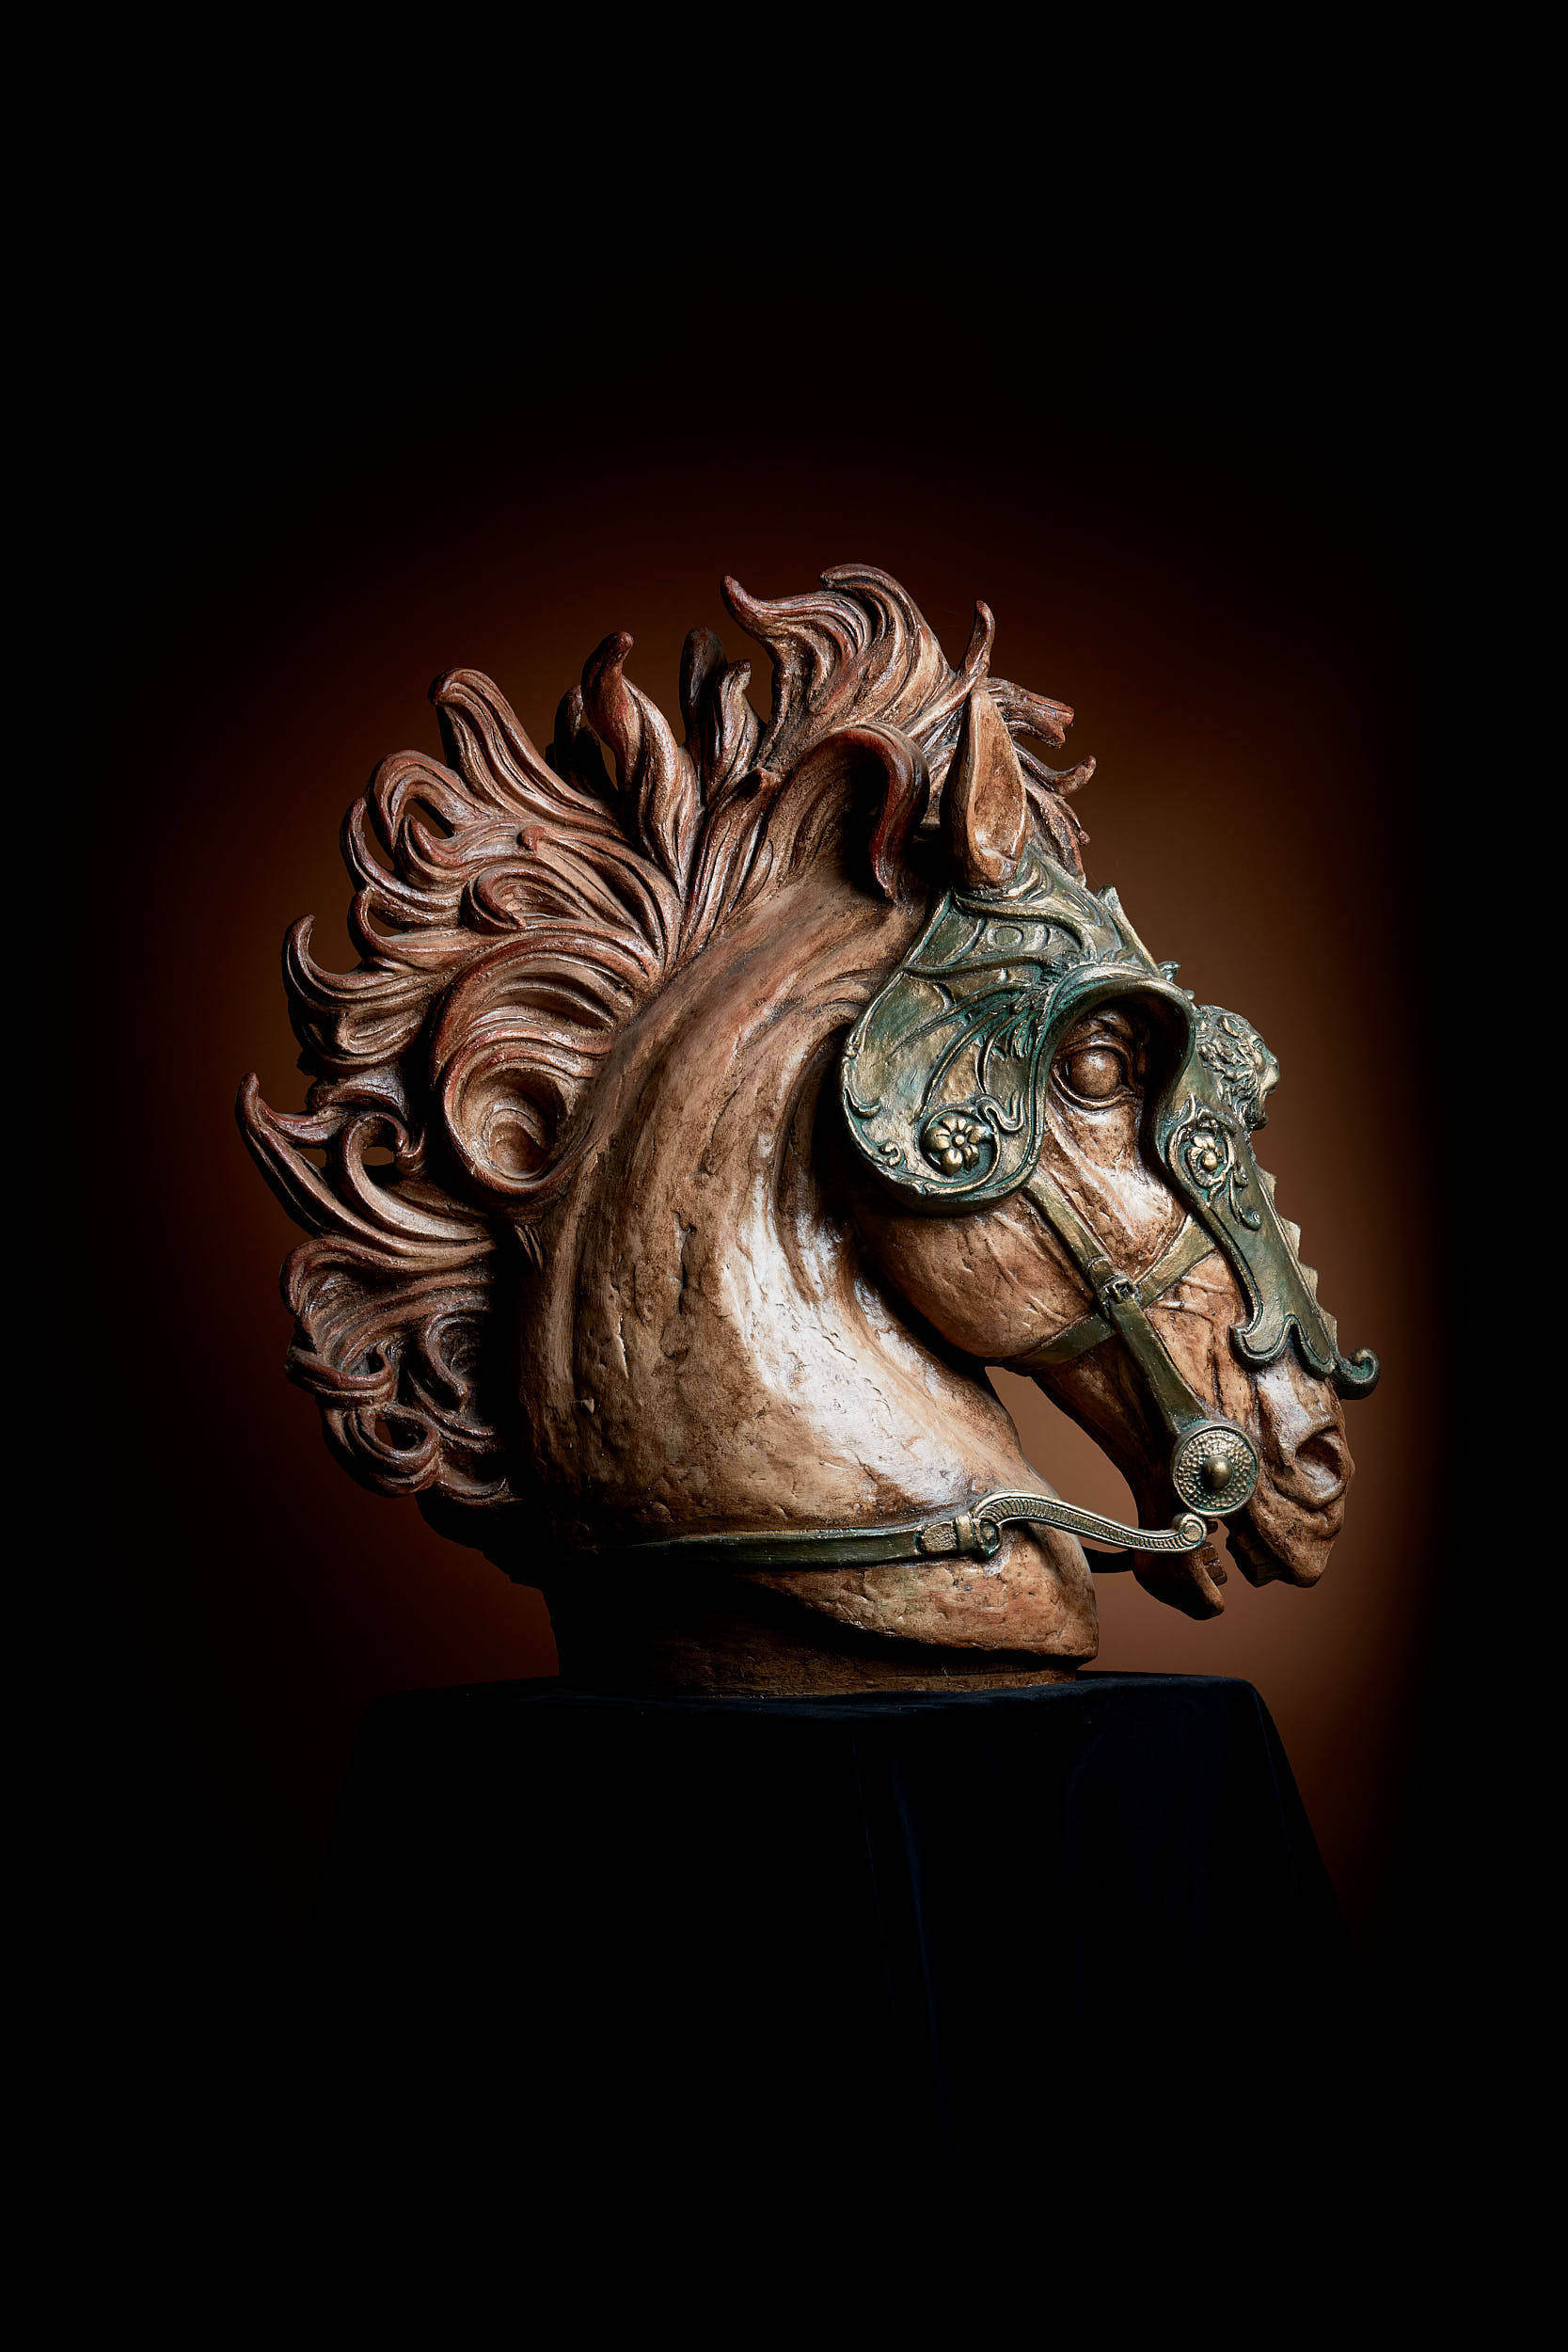 Skulptur Pferdekopf -  farbig gefasst